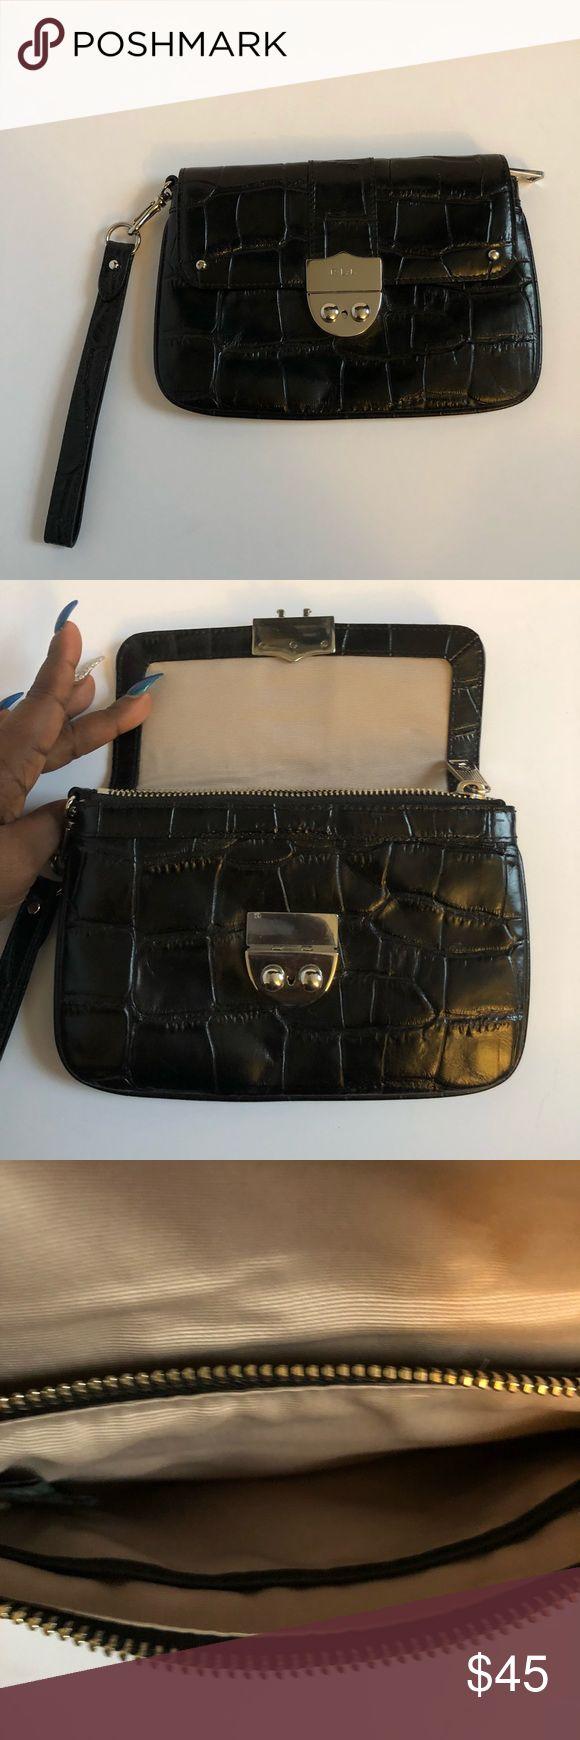 Ralph Lauren Wristlet Excellent condition. Barely used. No stains in the inside Lauren Ralph Lauren Bags Clutches & Wristlets